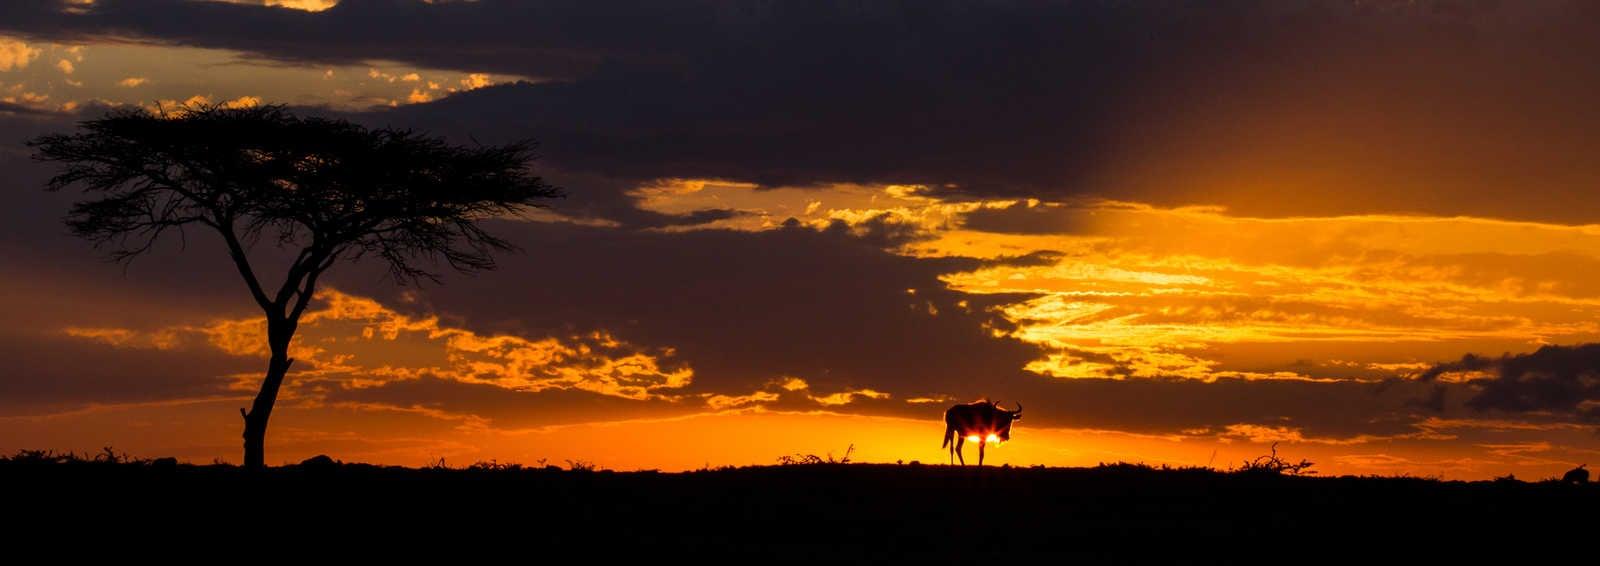 Wildbeest sunset, Masai Mara